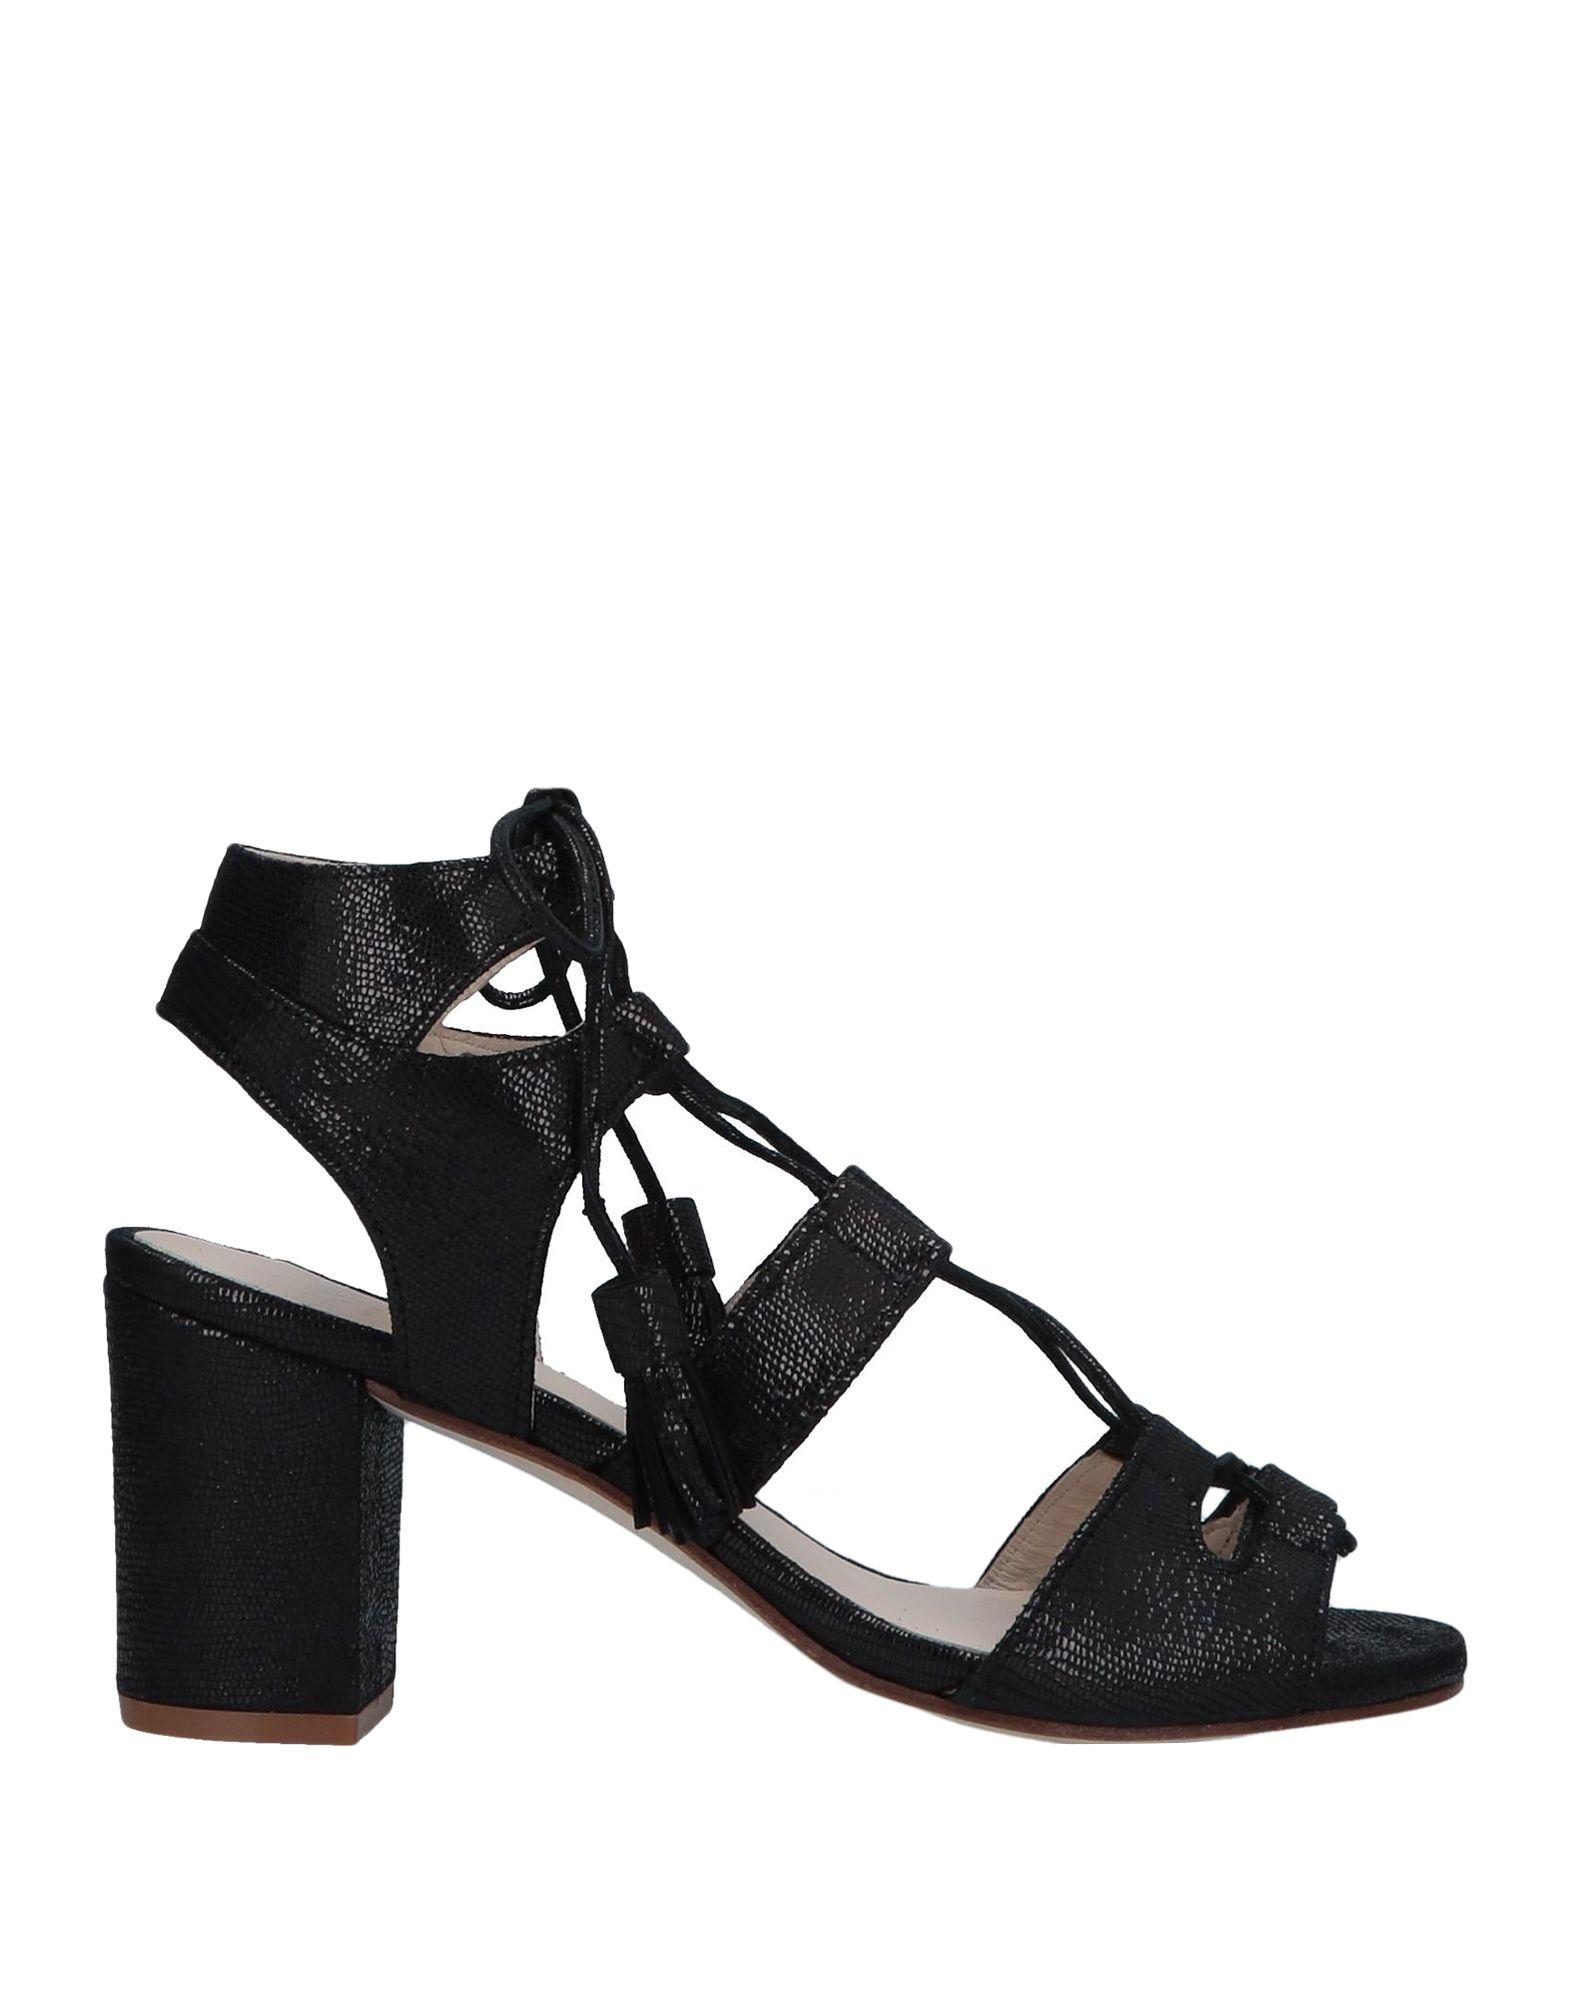 Sandales Anaki Femme - Sandales Anaki   - 11671543LW